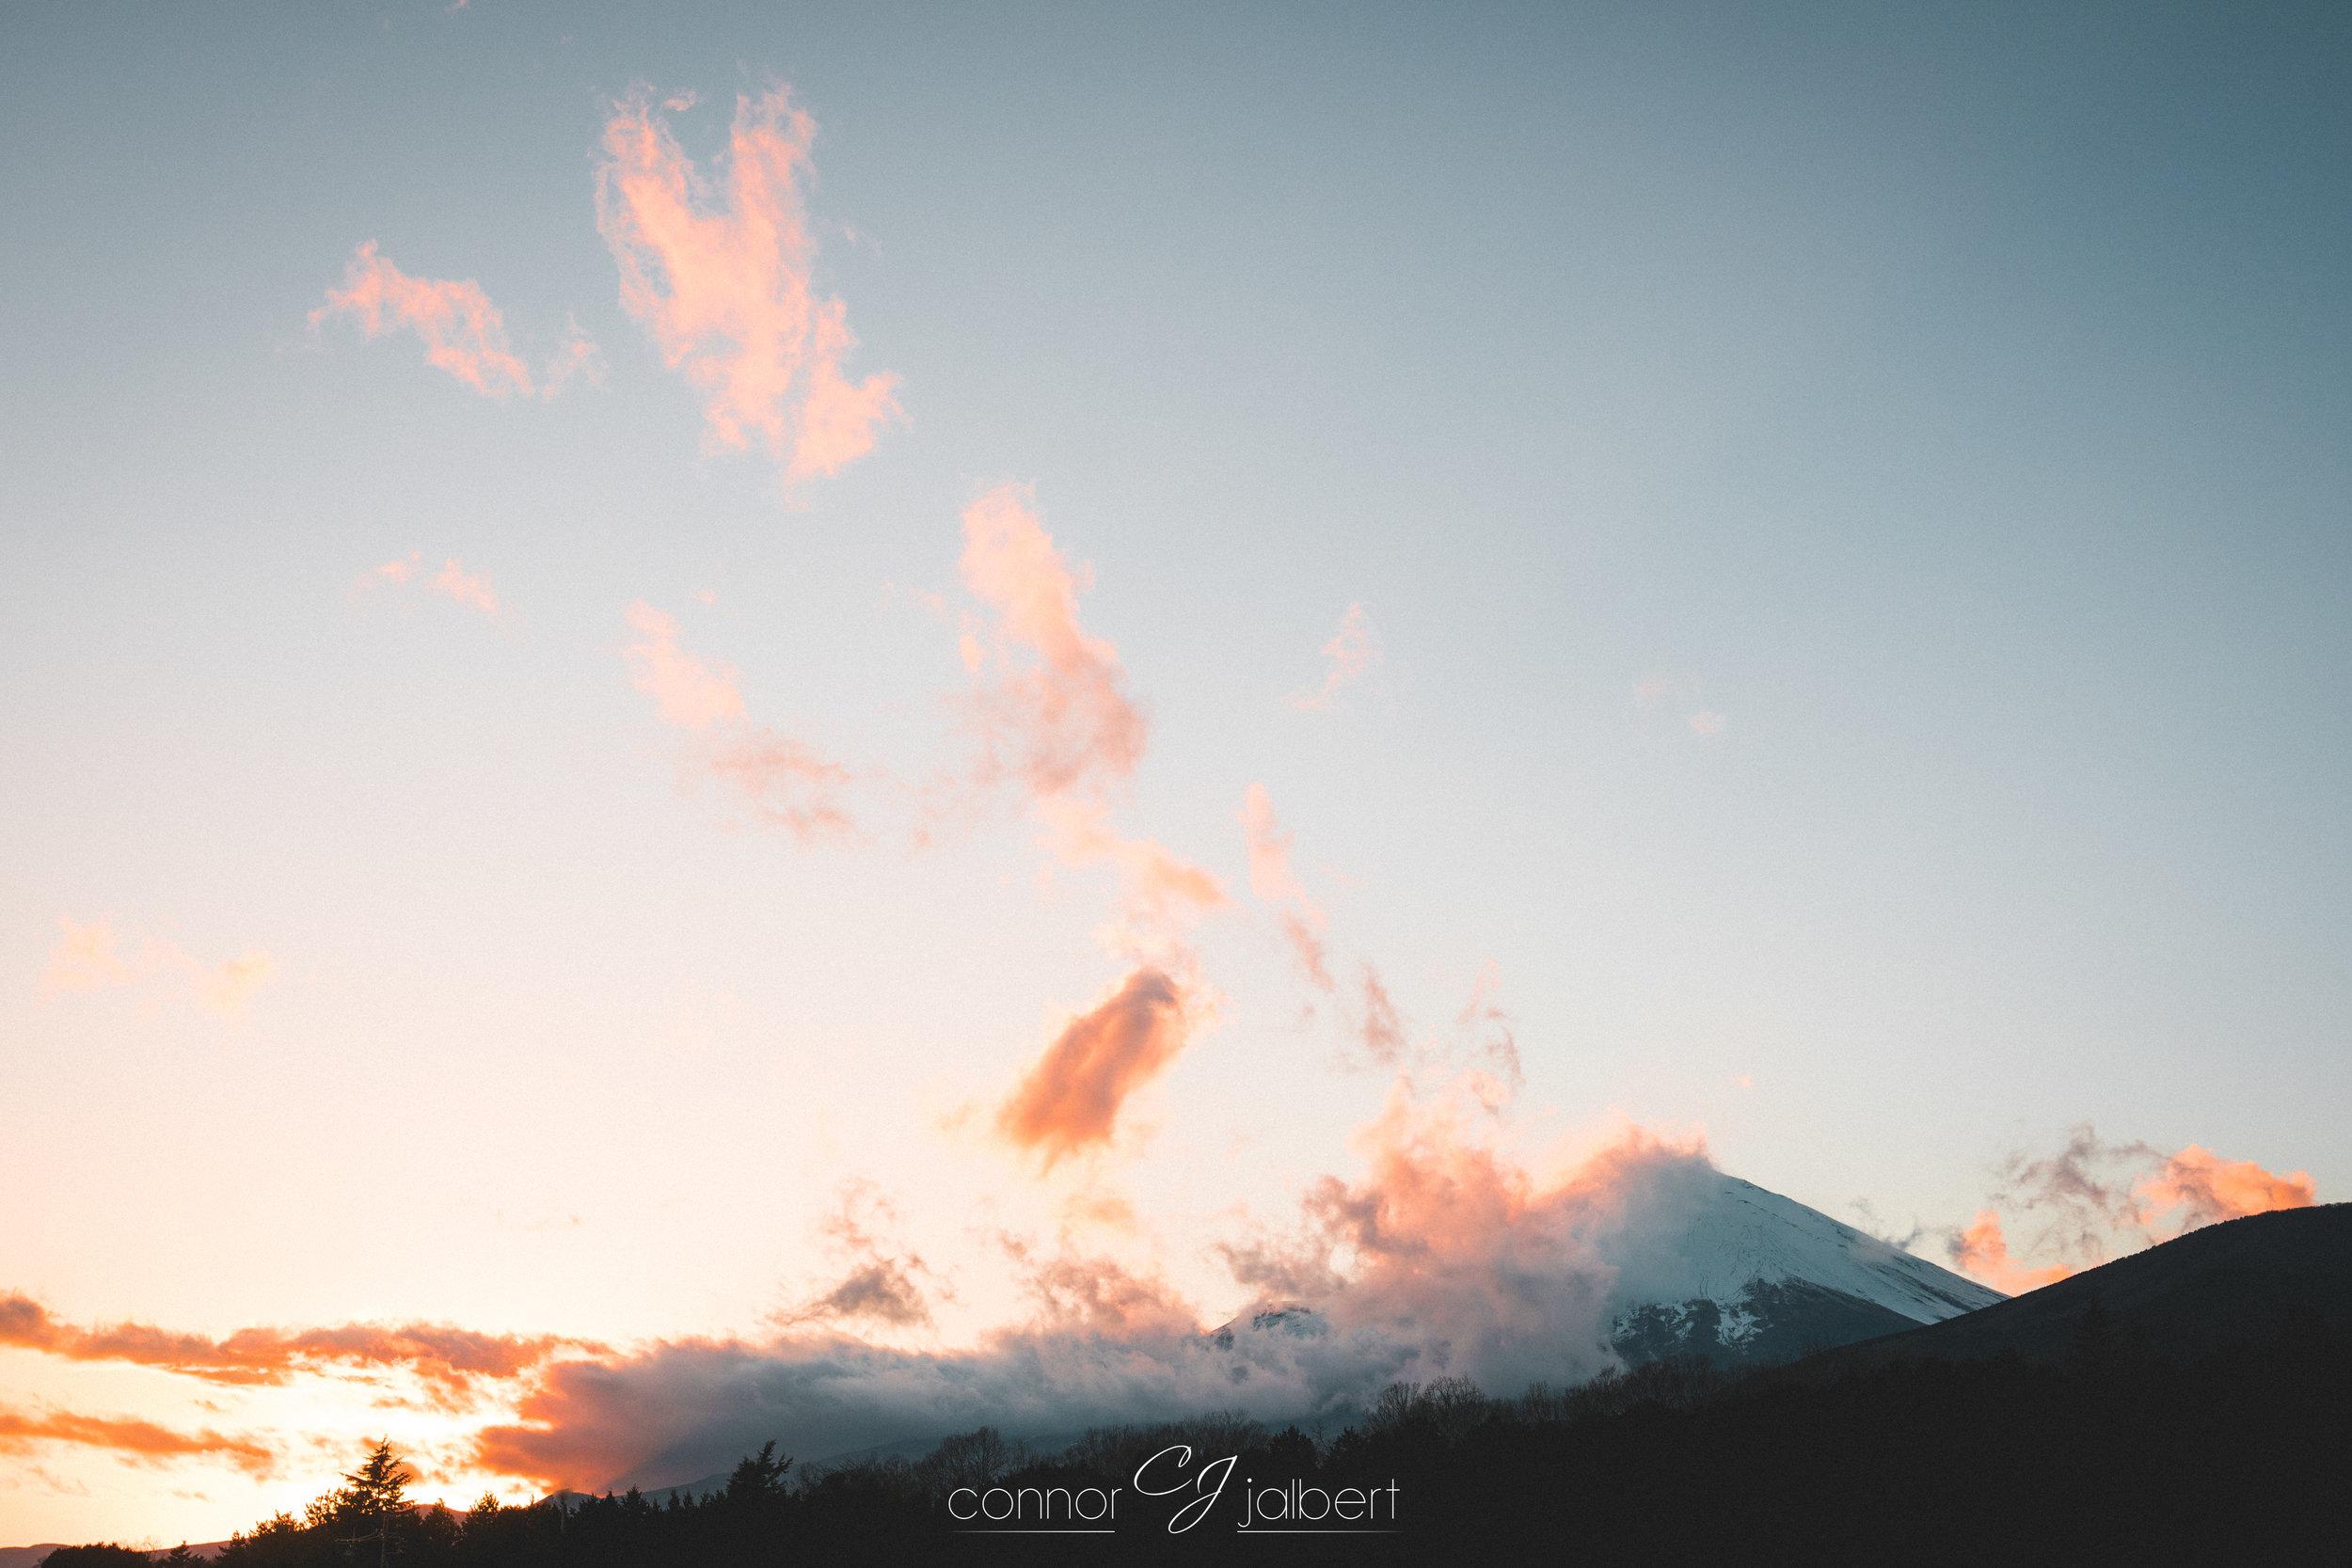 Mt. Fuji at Fuji Speedway